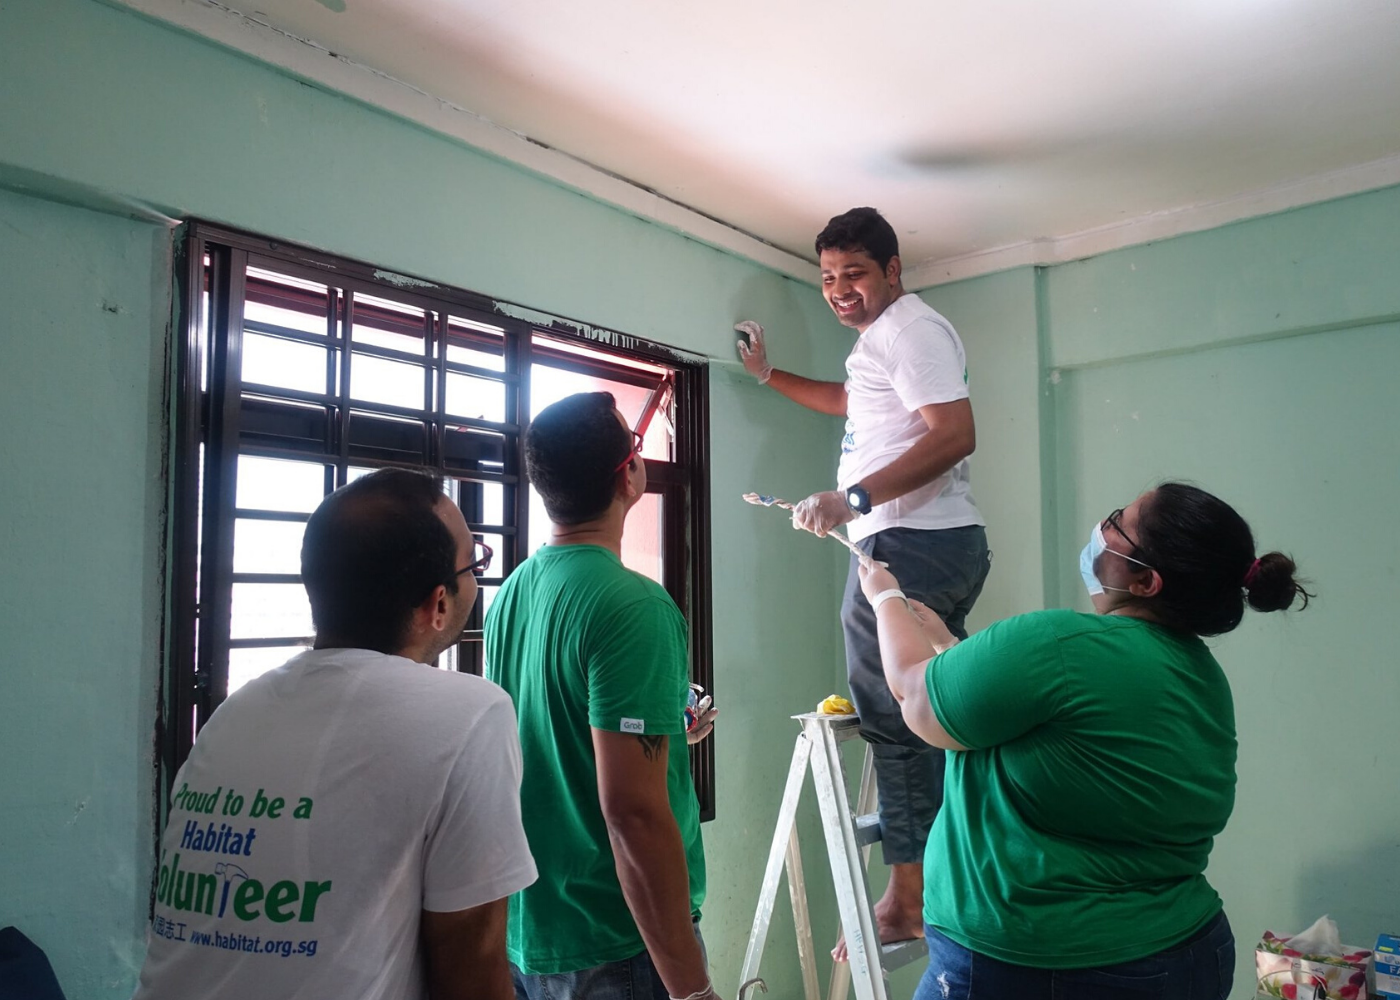 Volunteer in Singapore: Habitat for Humanity